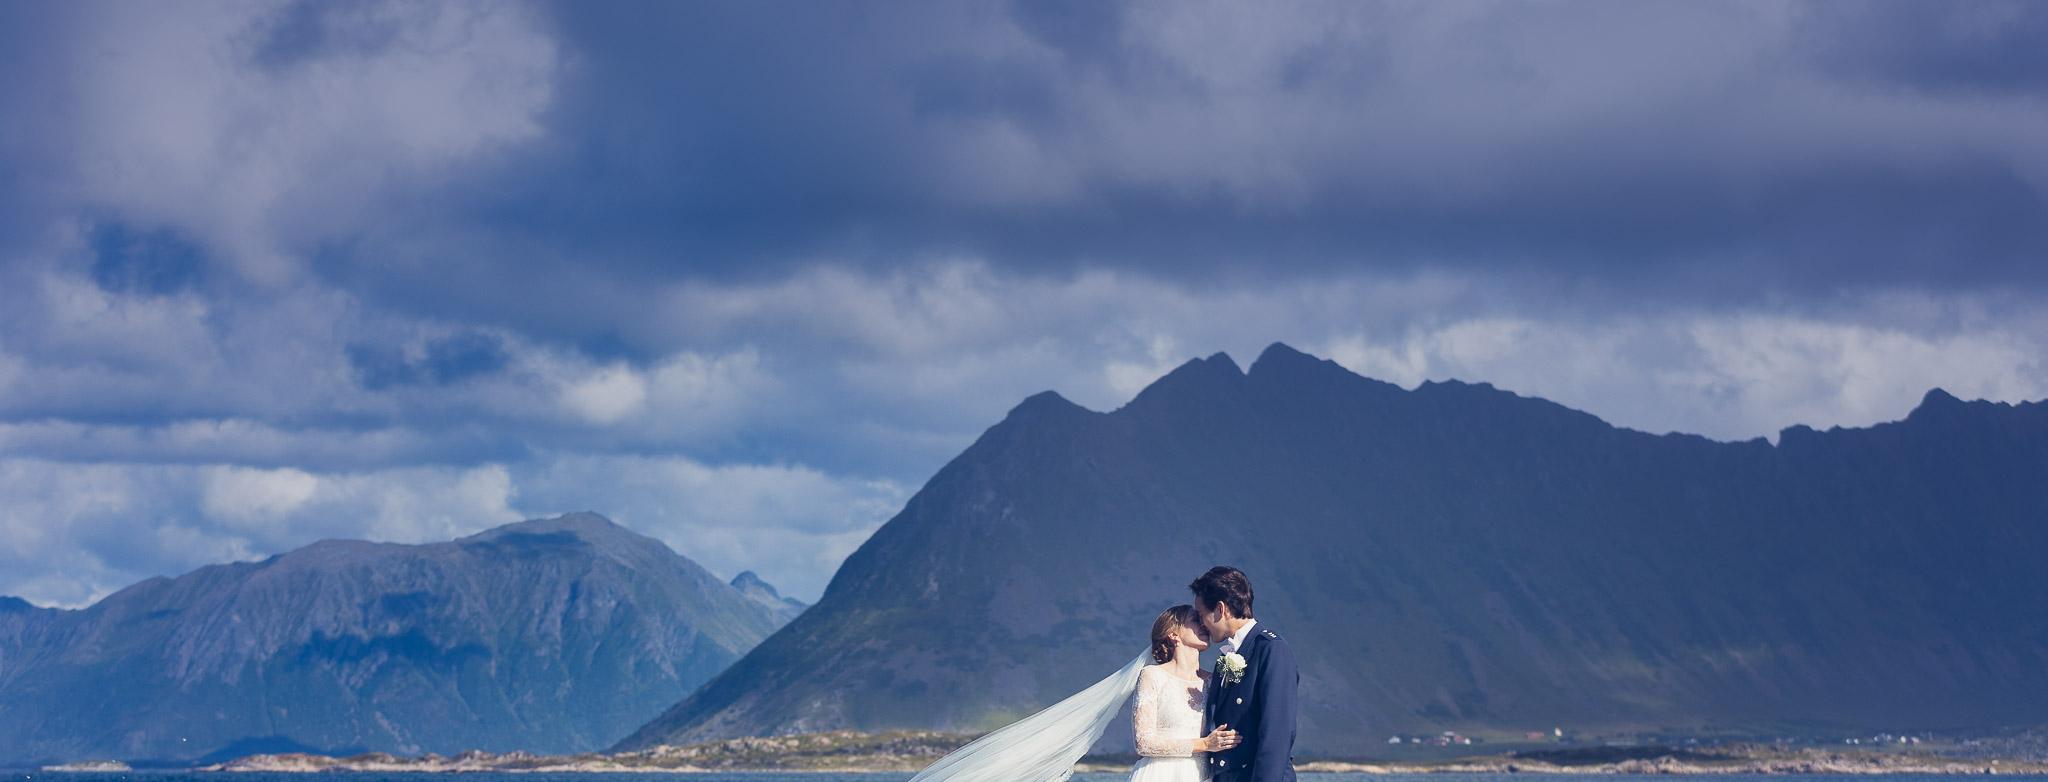 Bryllupsfotografering-lofoten-heldags-fjell-24